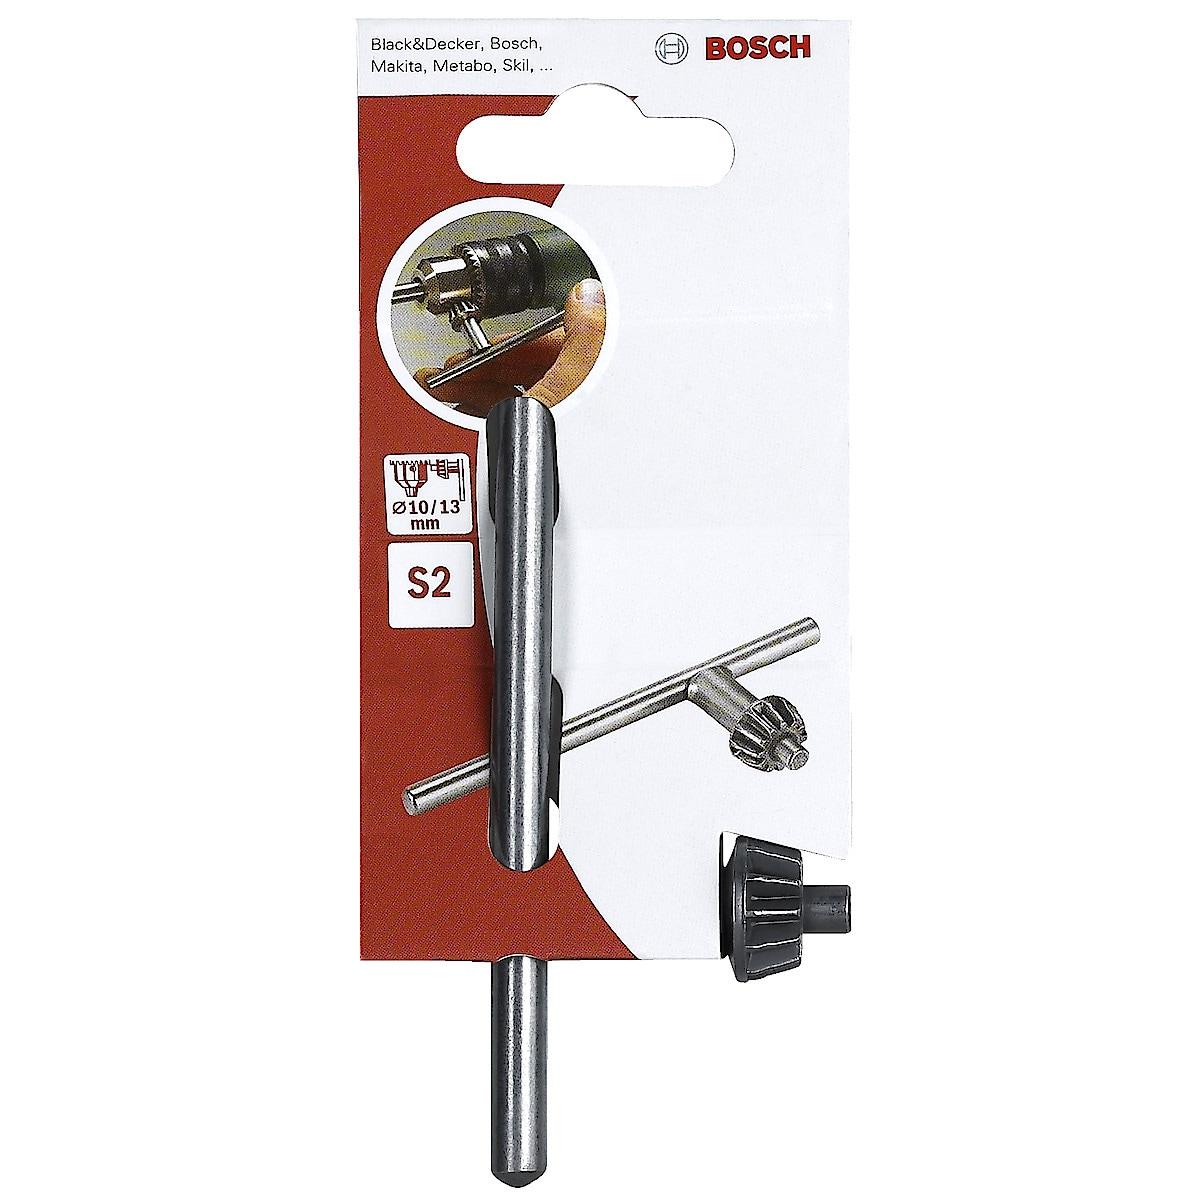 Bosch s2 Chuck Key